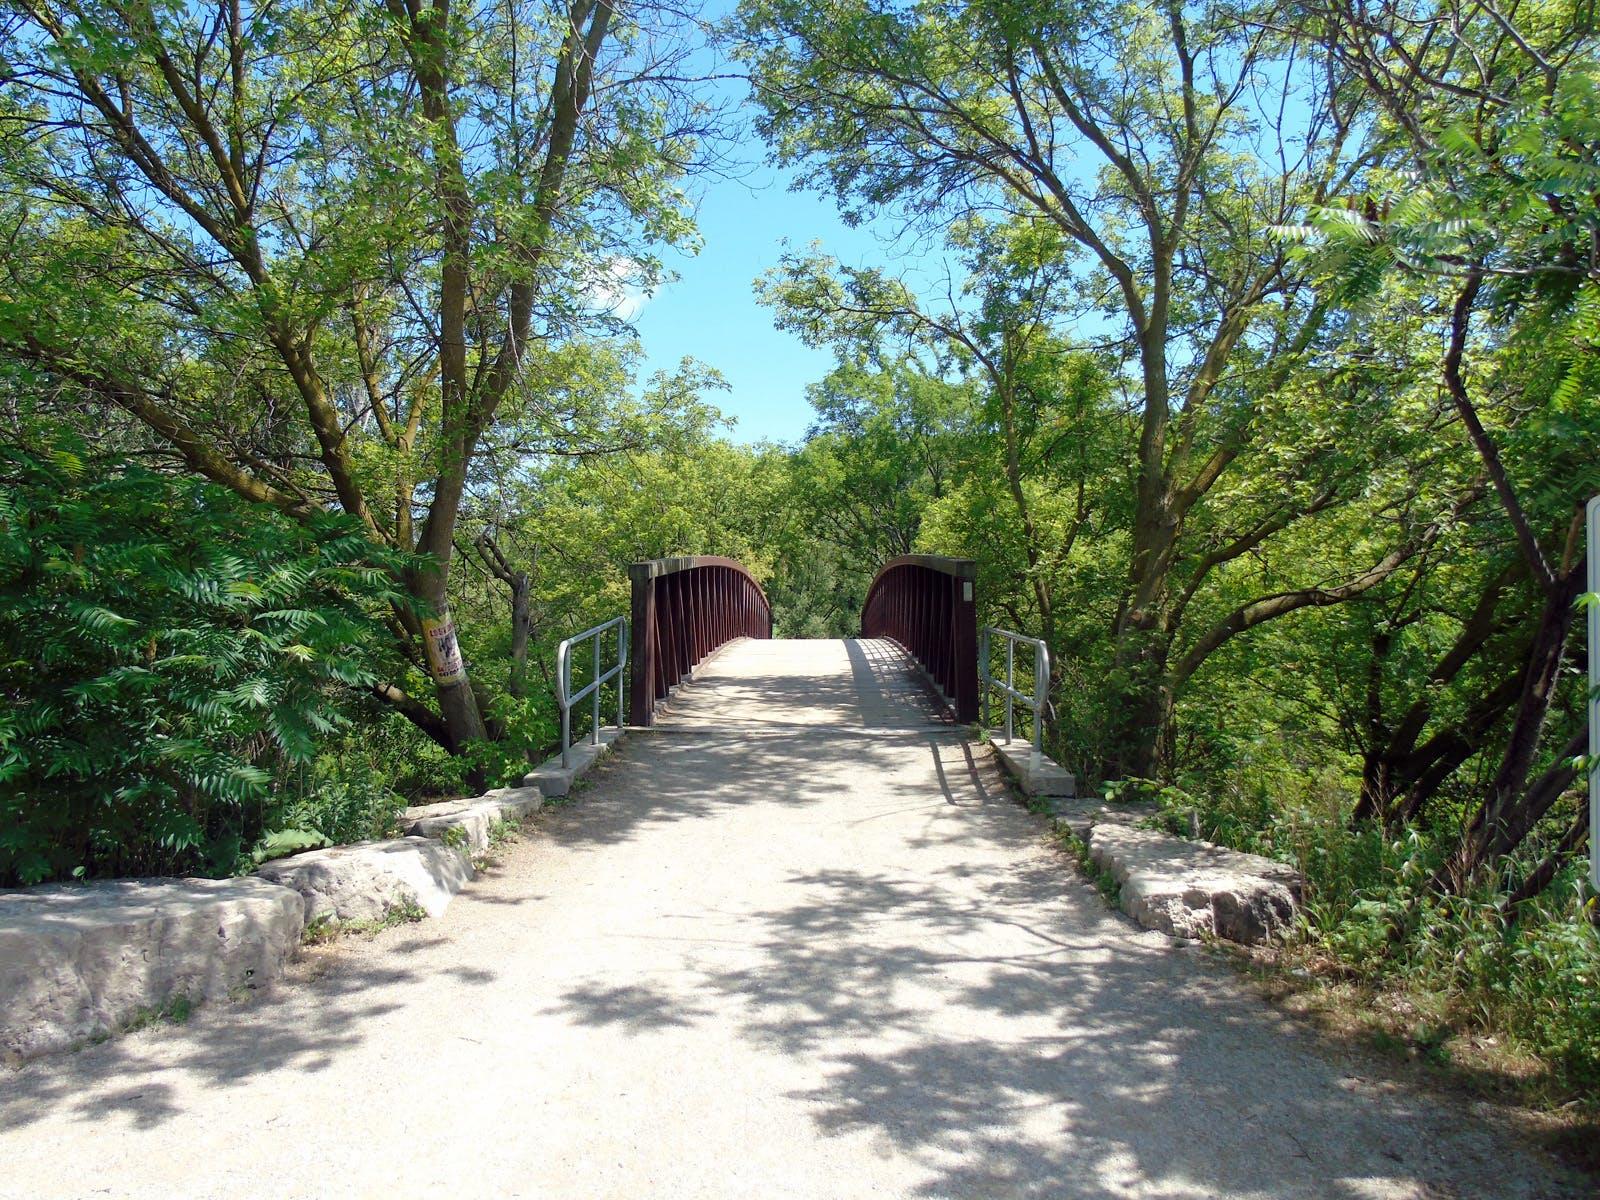 Pedestrian bridge over the Credit River